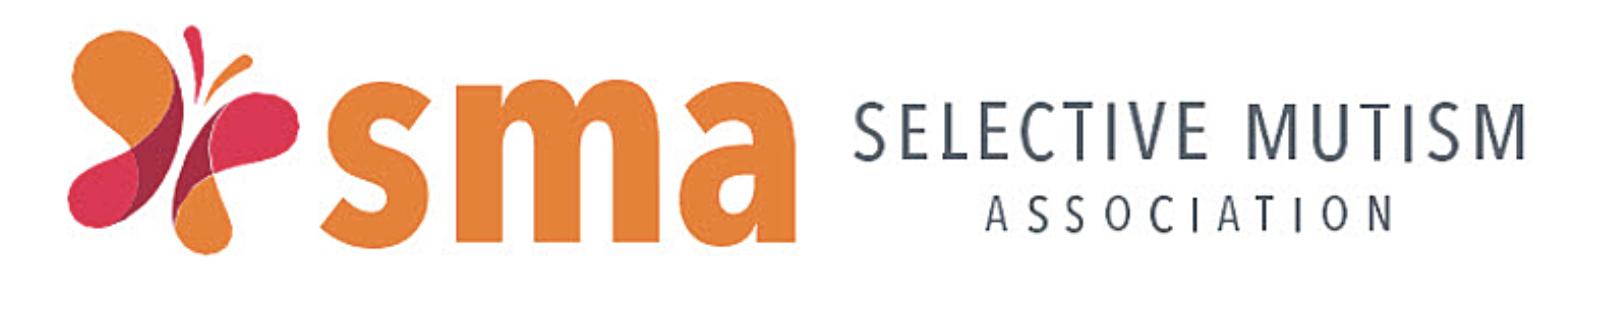 Selective Mutism Association (SMA)